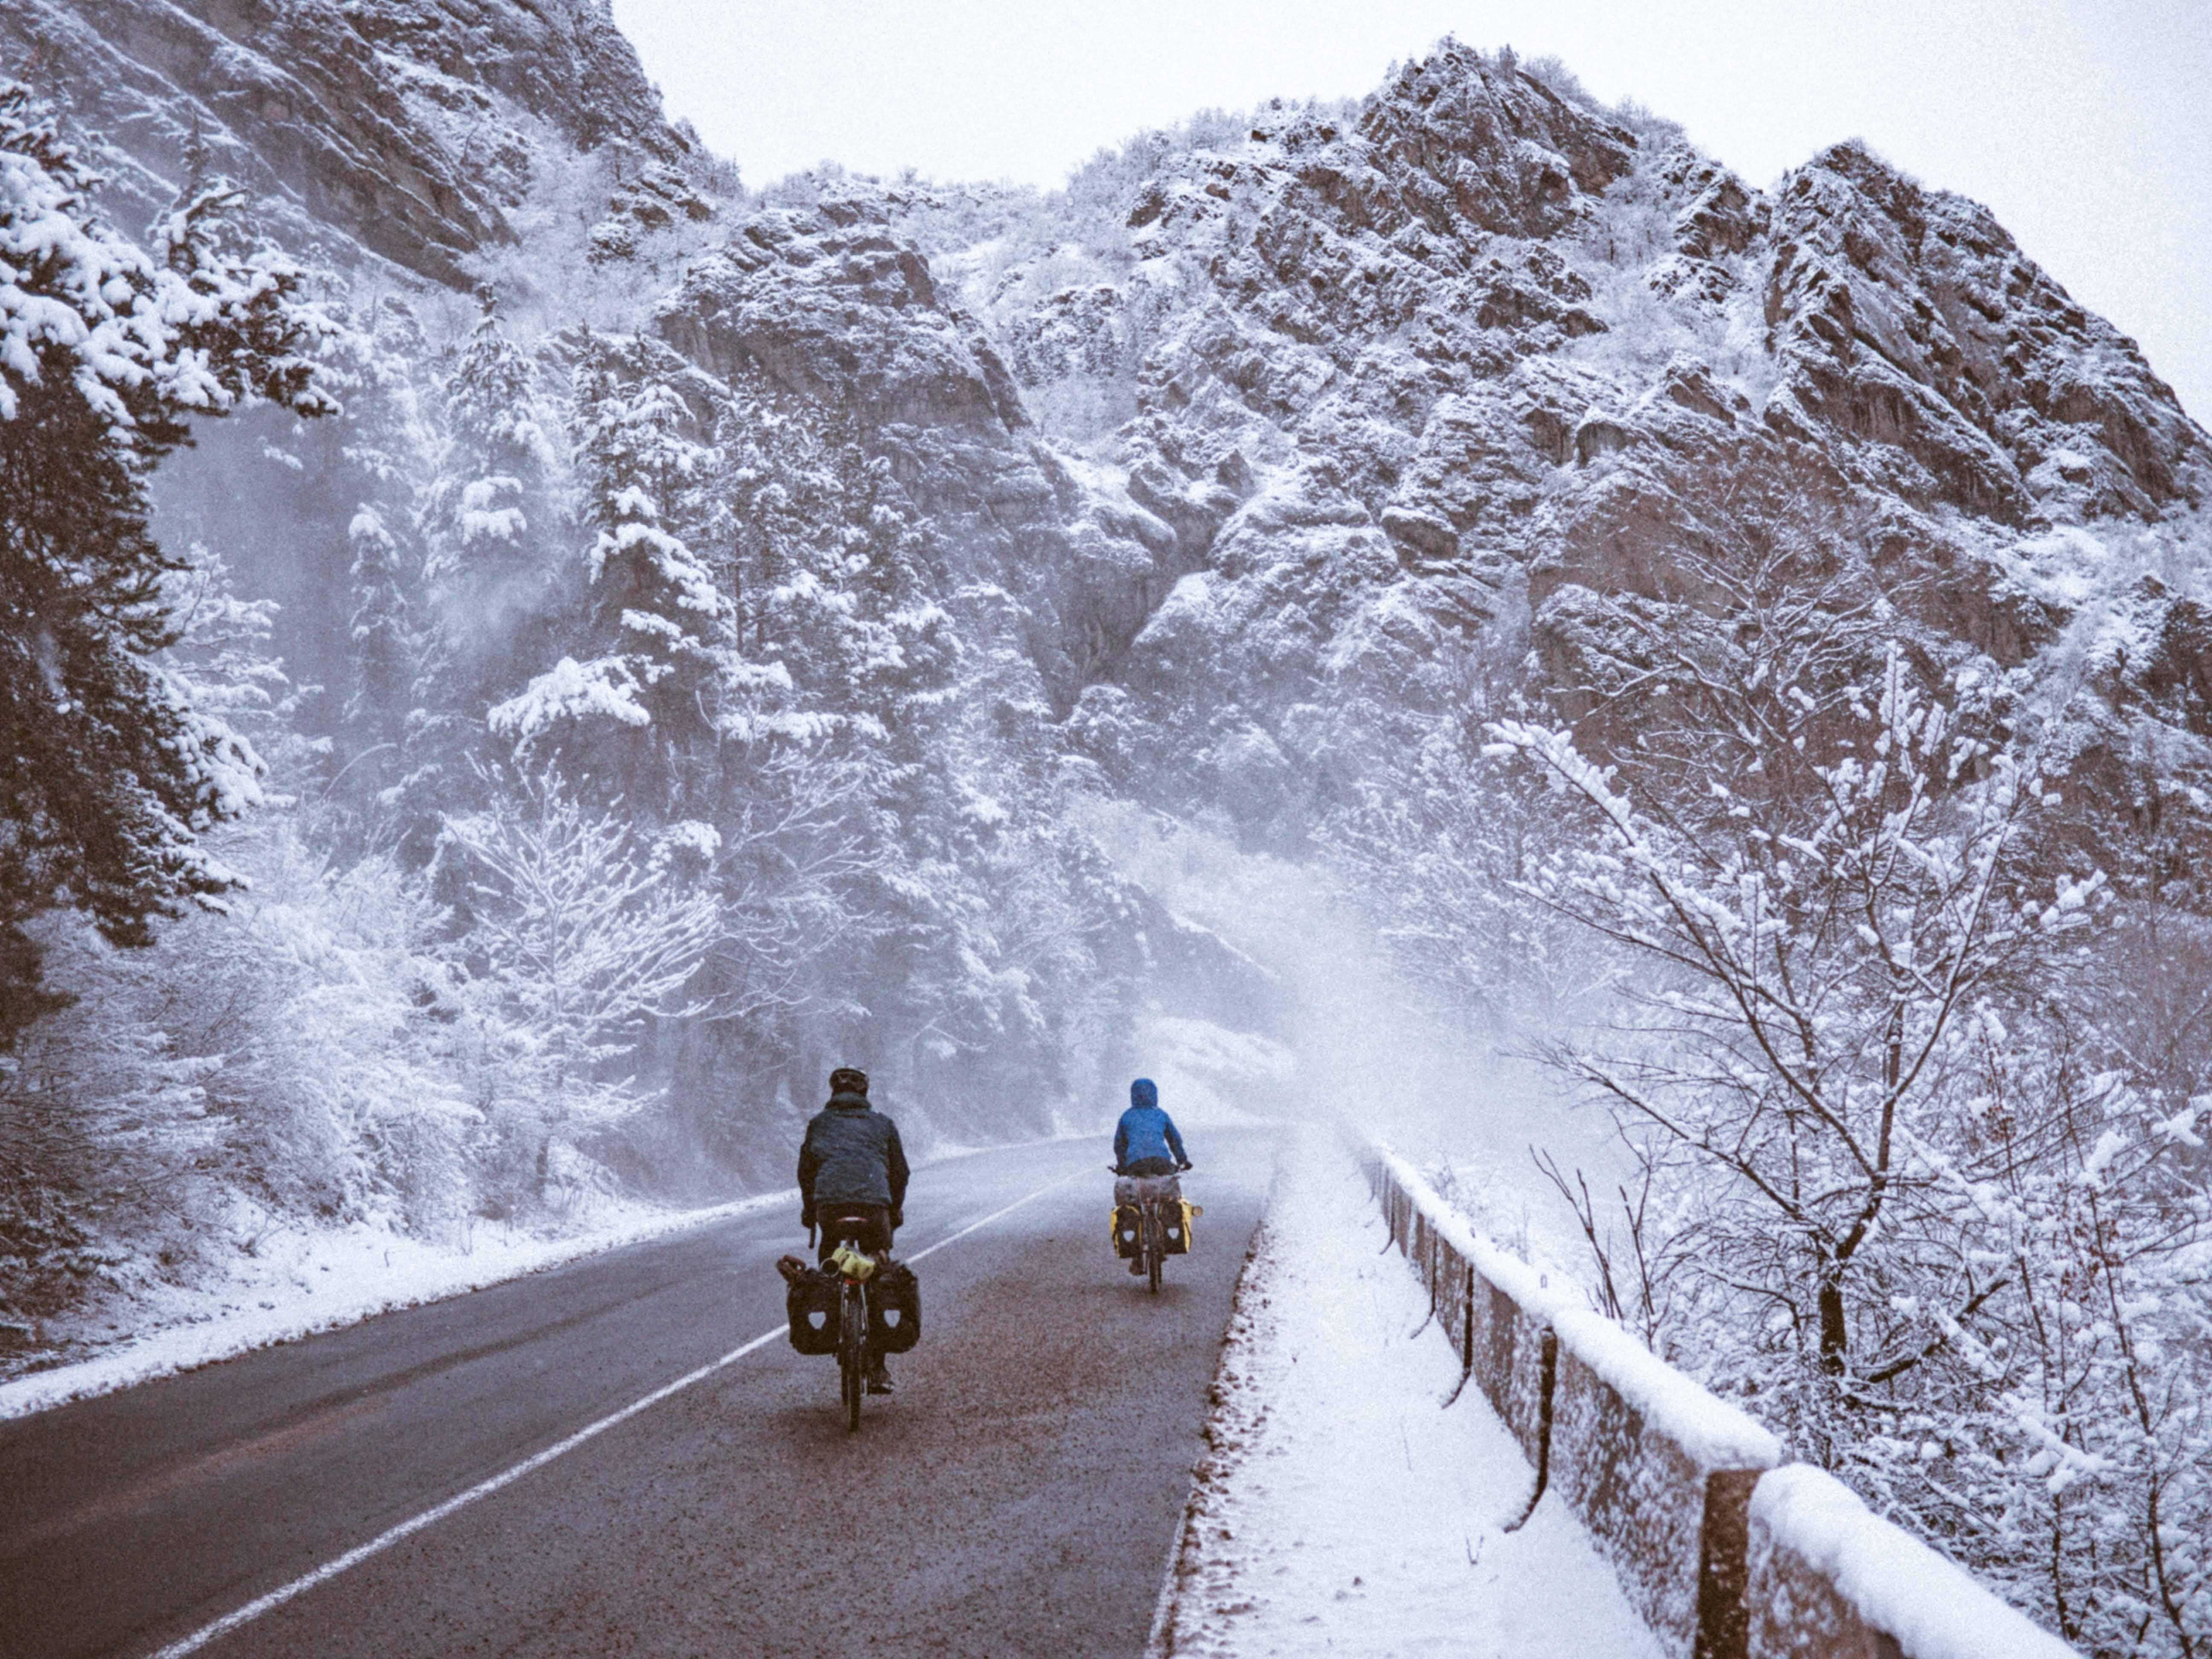 Day 280 – Winter Has Come